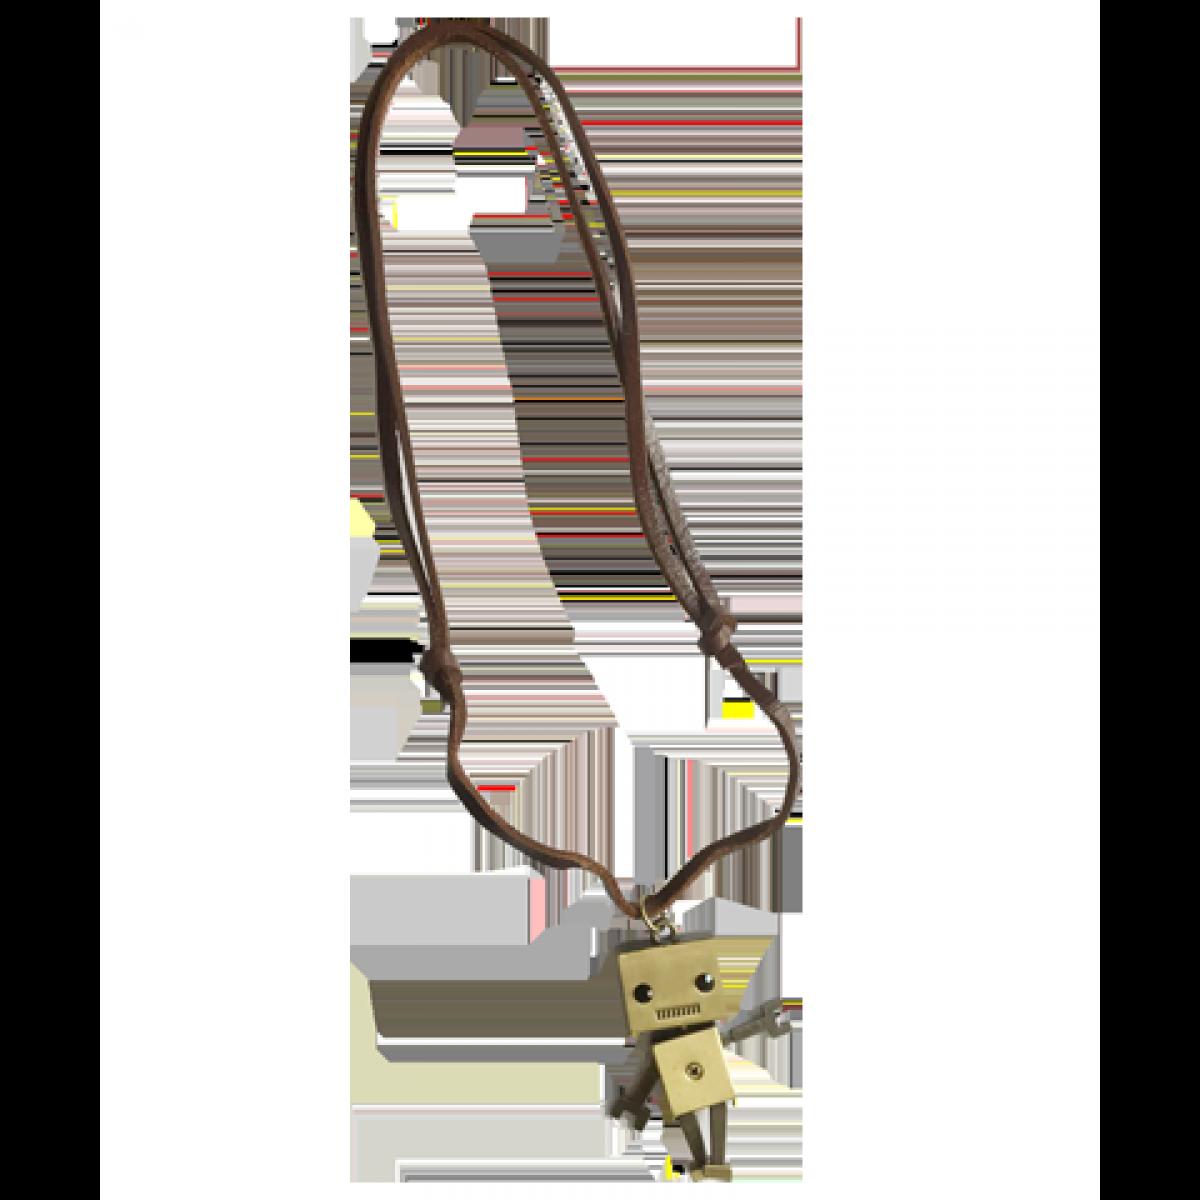 Vex Robotics Necklace